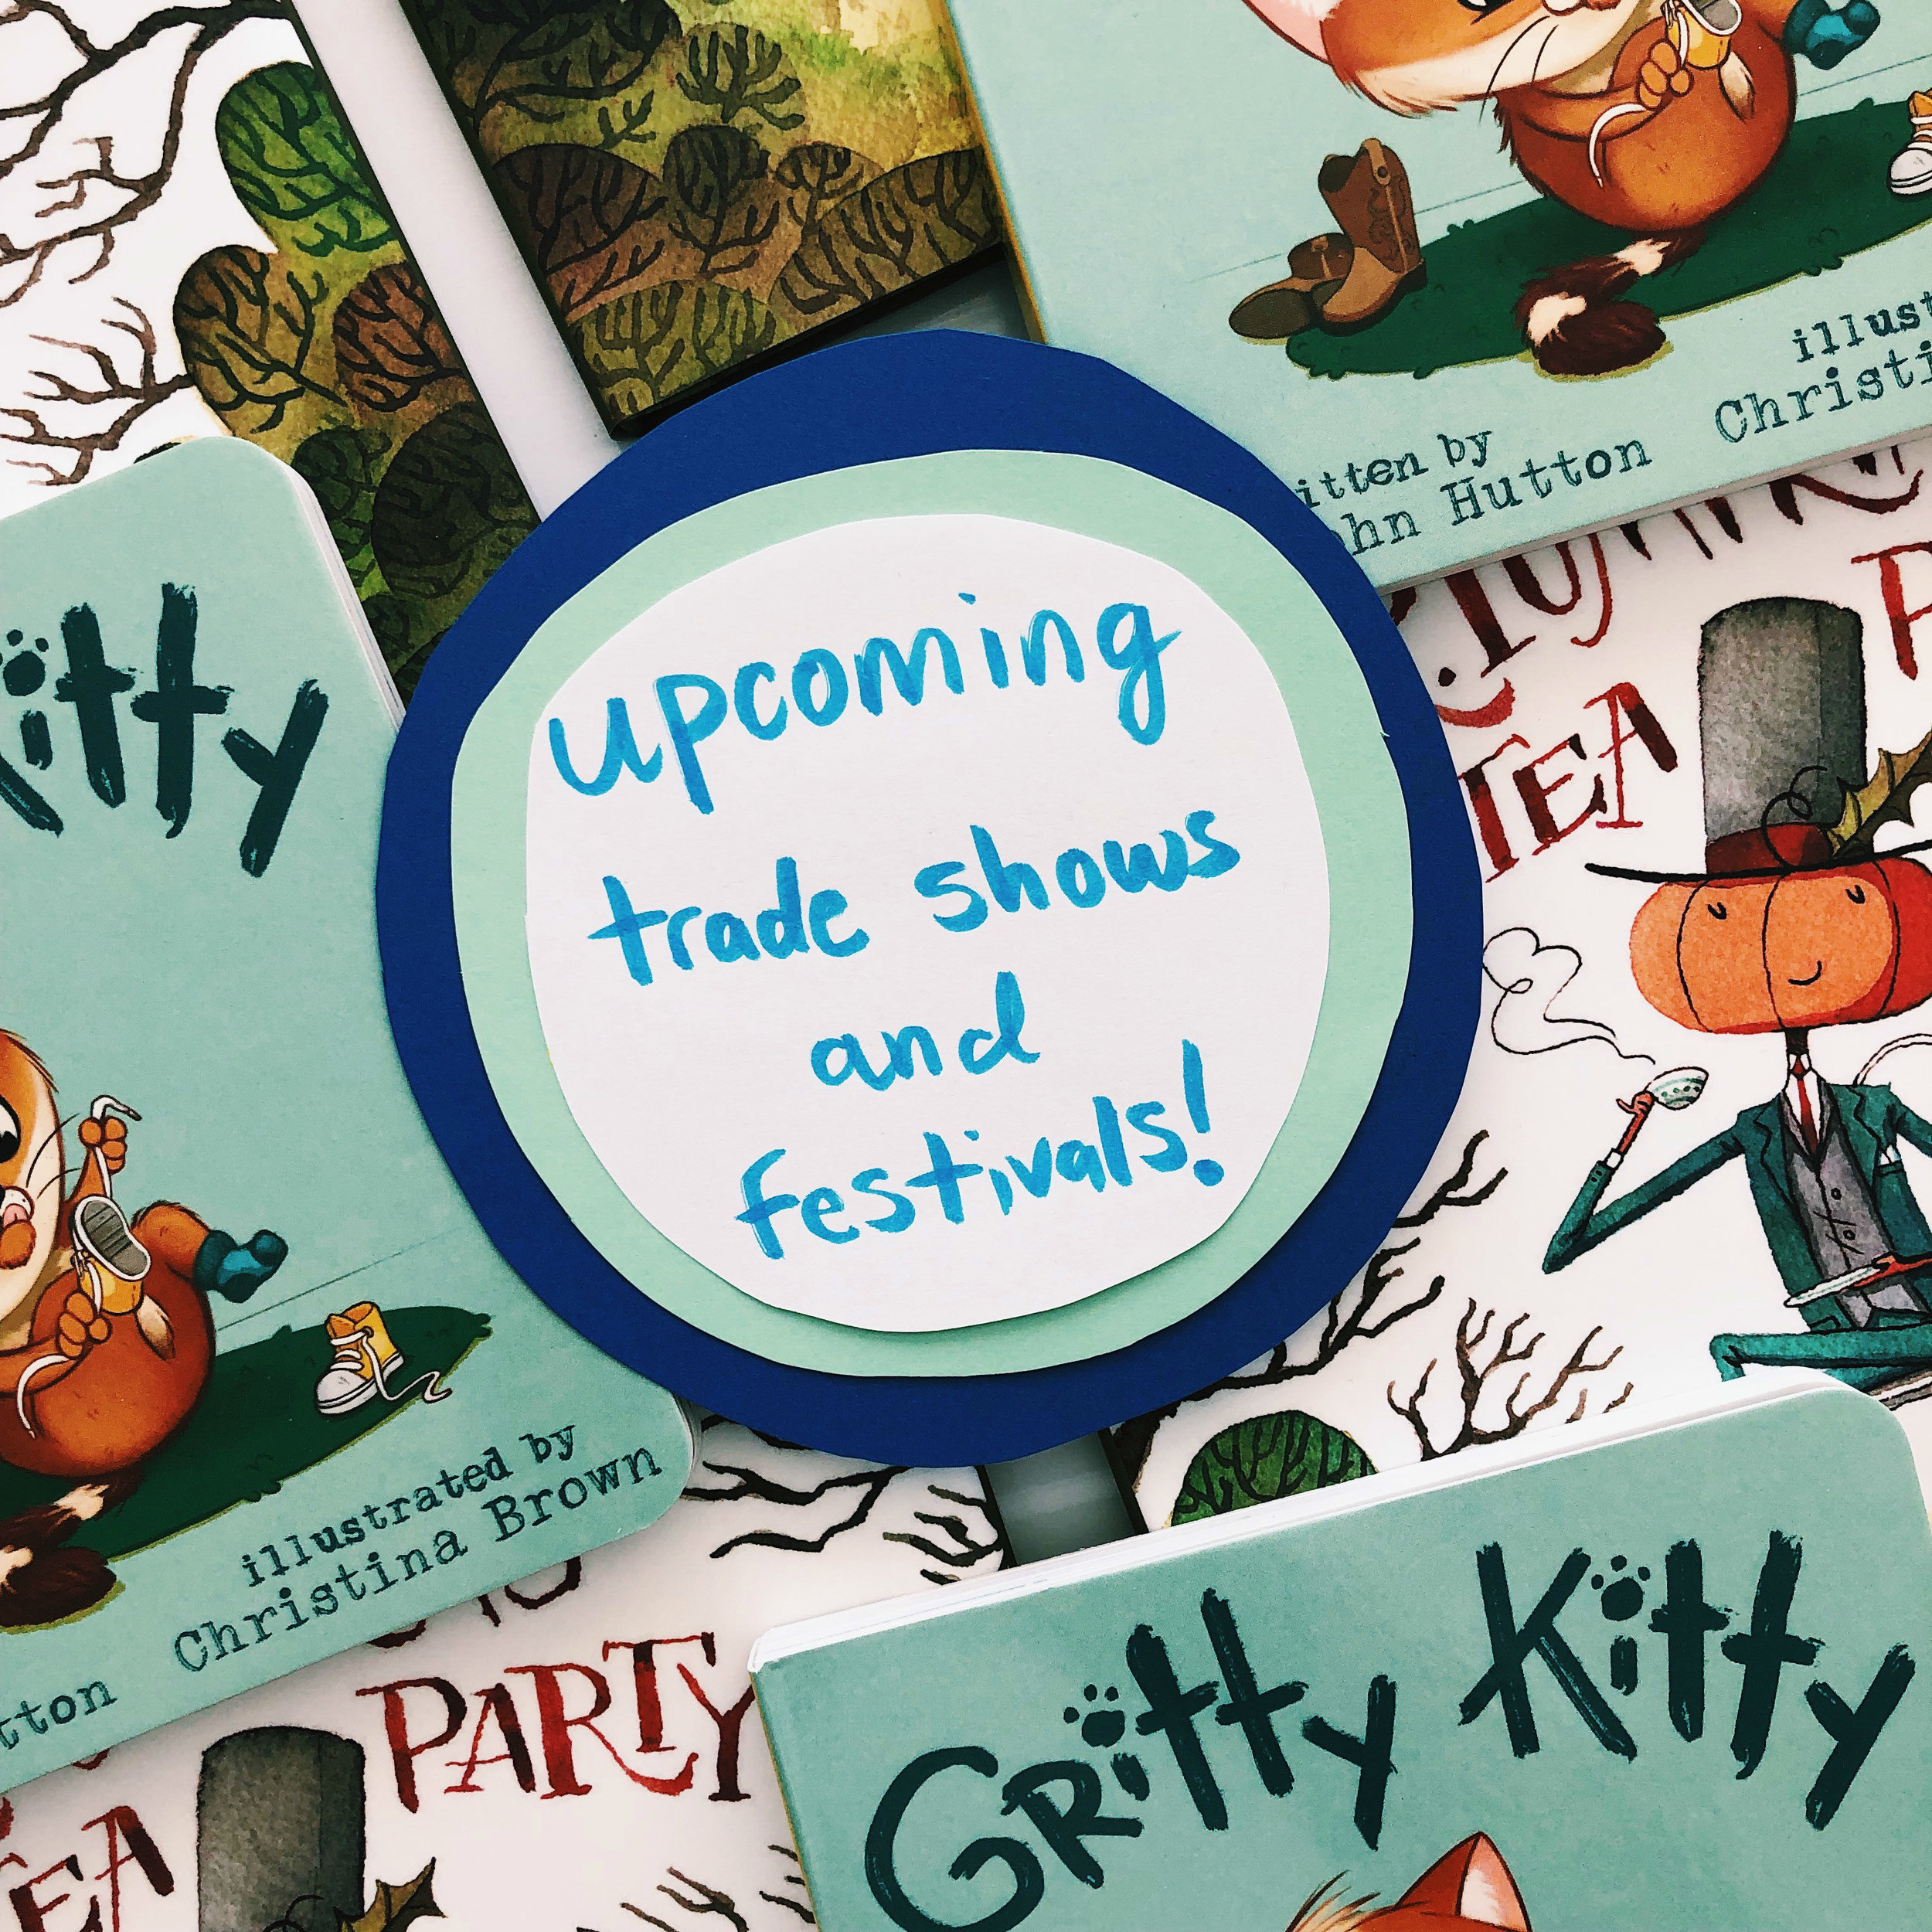 blue manatee press_upcoming book trade shows and book festivals.JPG